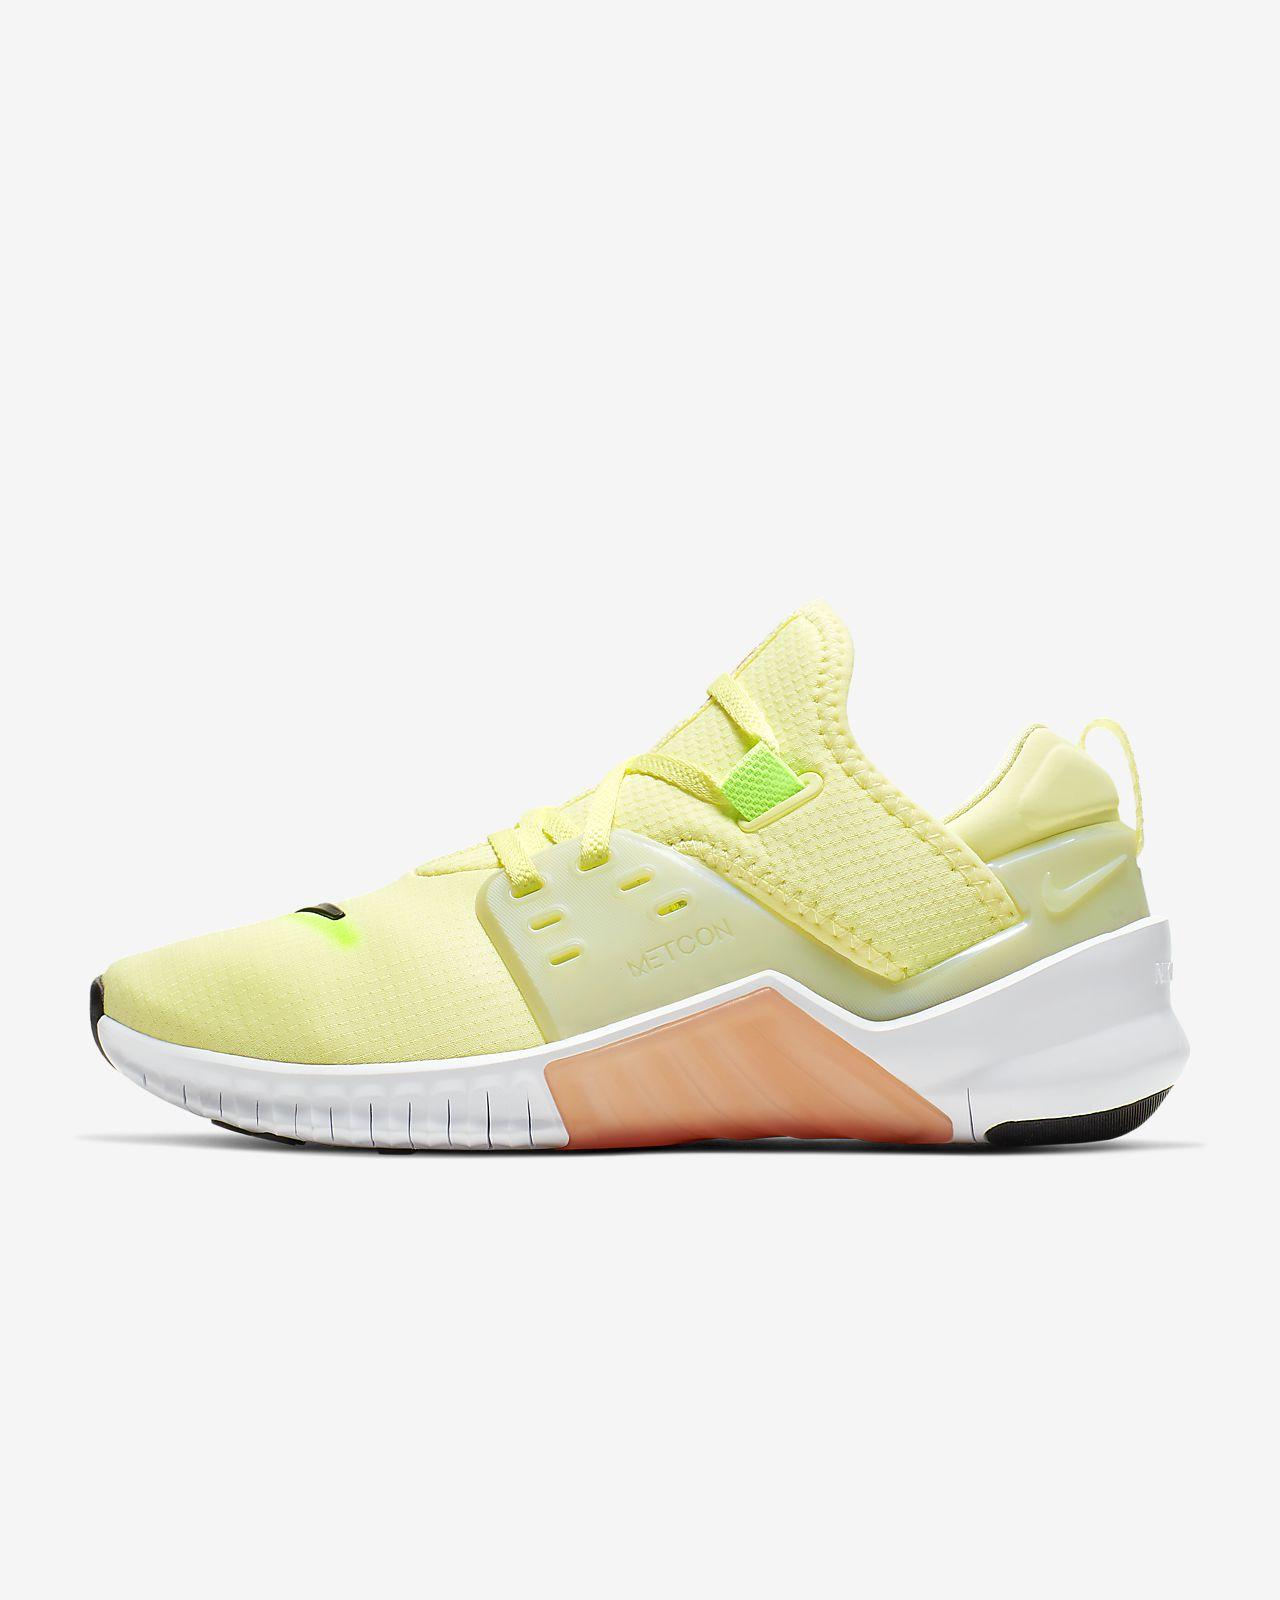 Nike Free Metcon 2 AMP Damen-Trainingsschuh